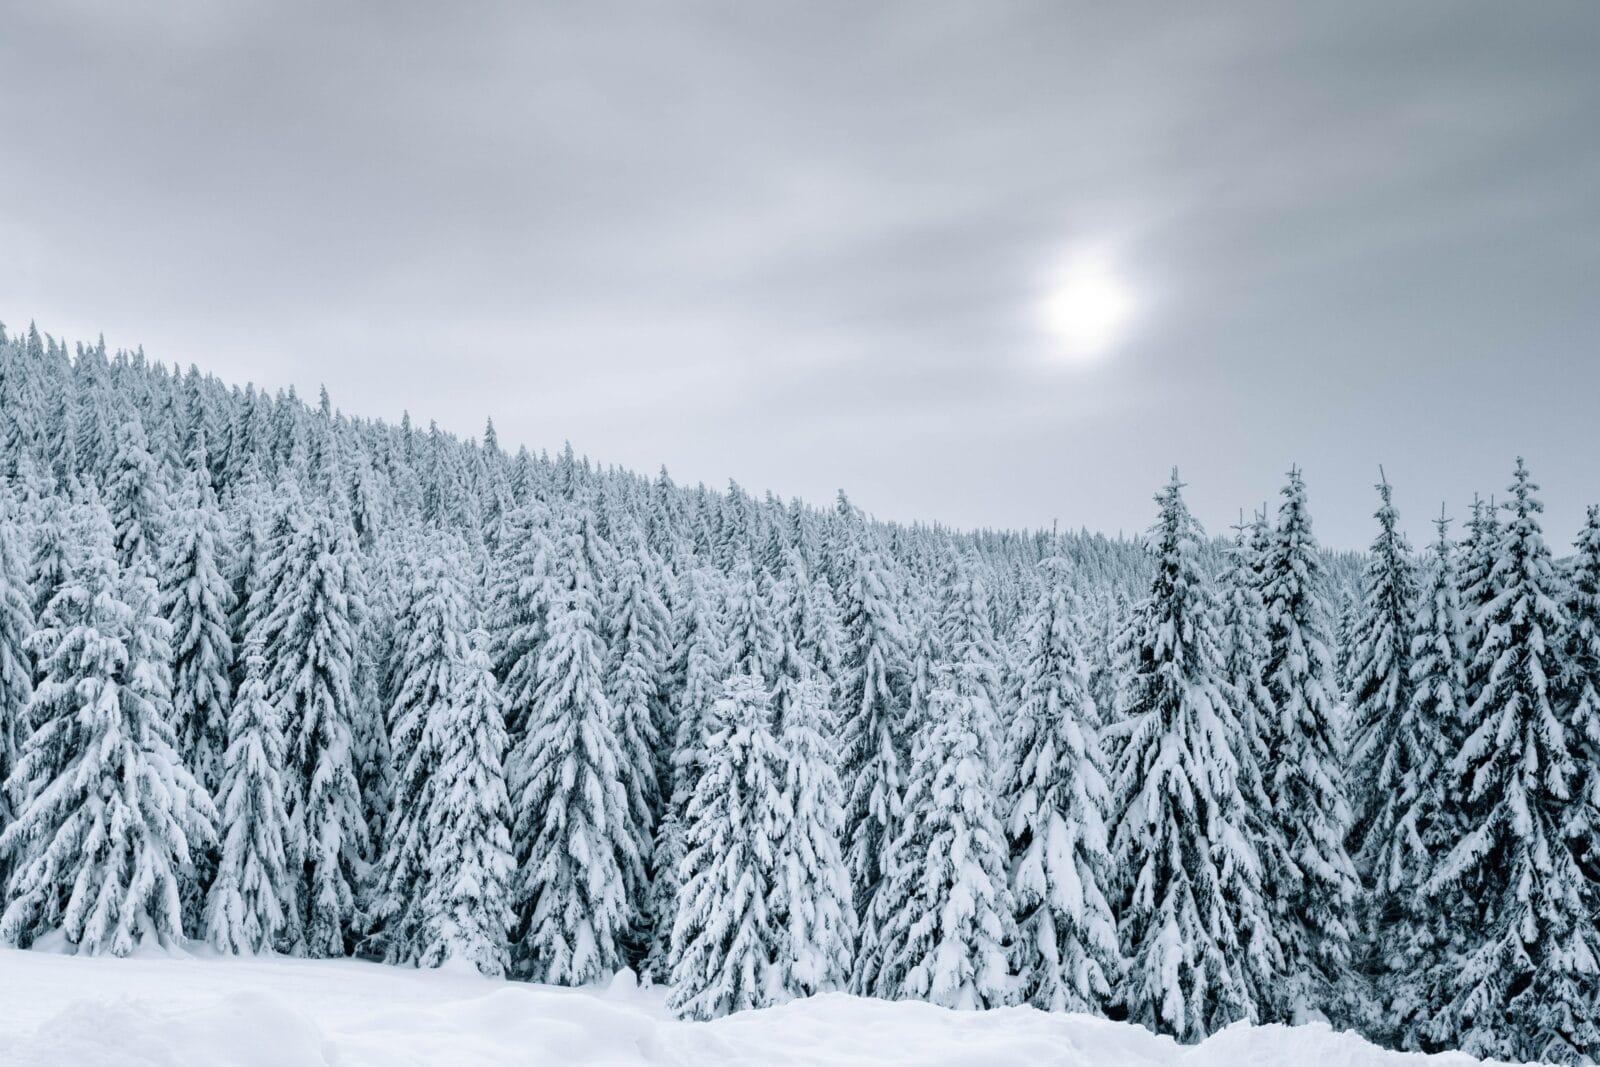 Snowy Treescape